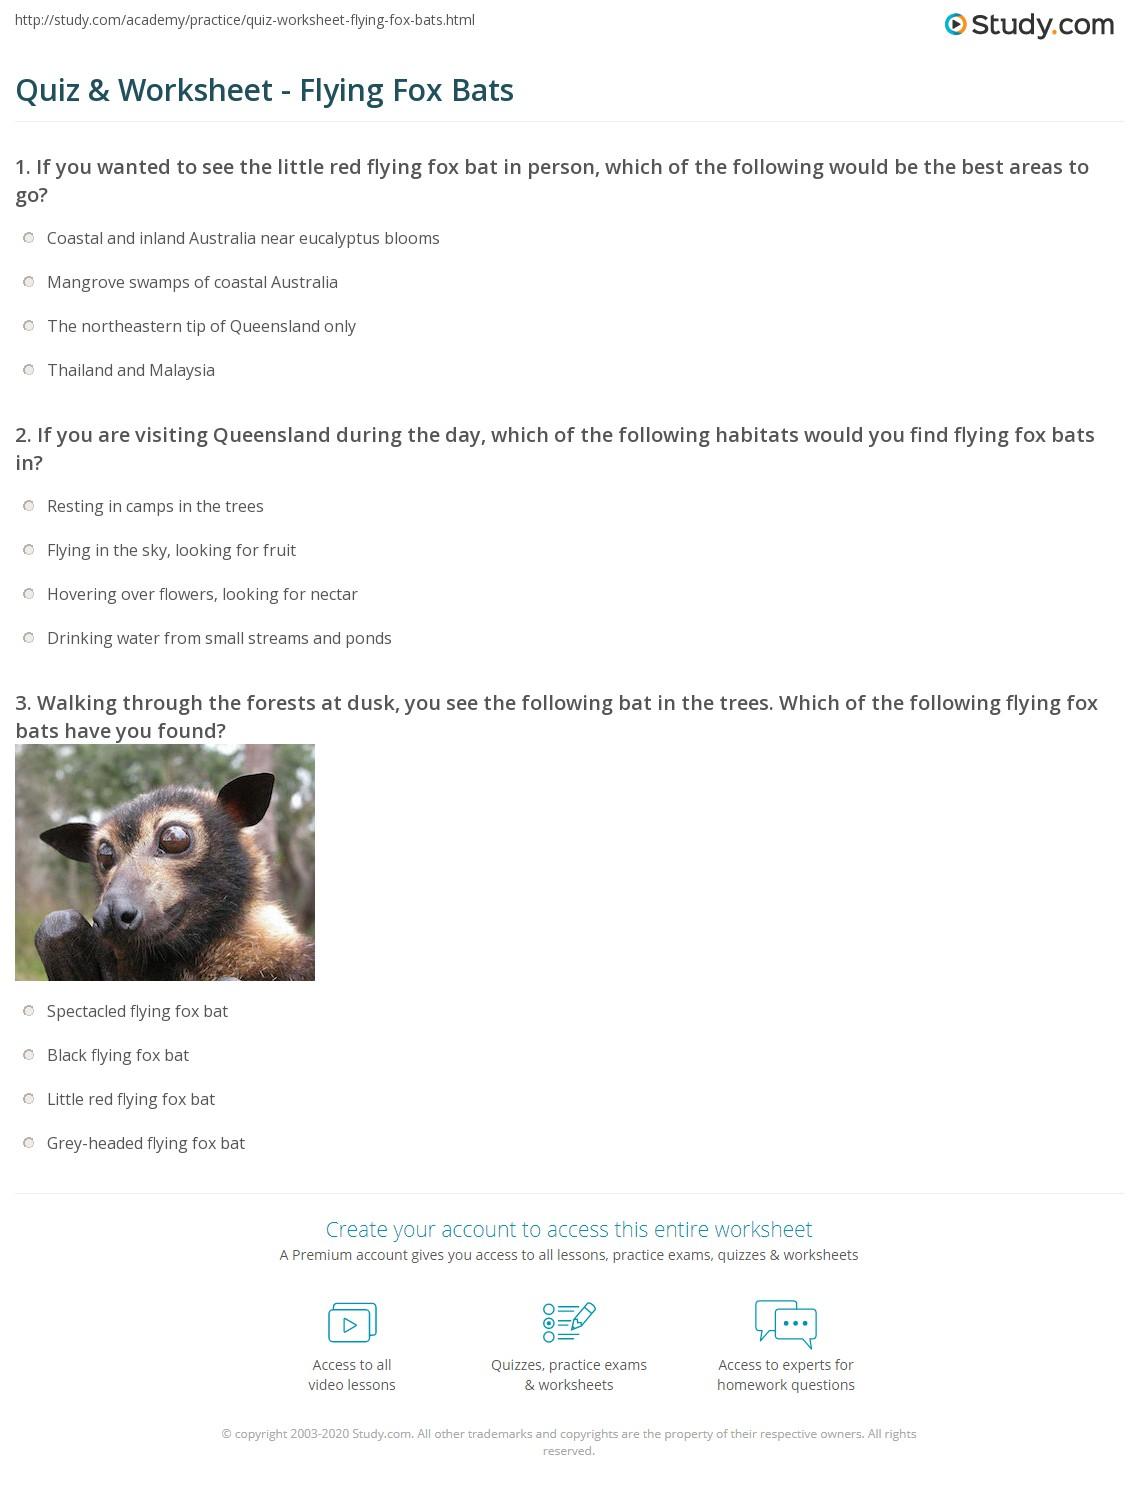 Quiz Worksheet Flying Fox Bats Study Com